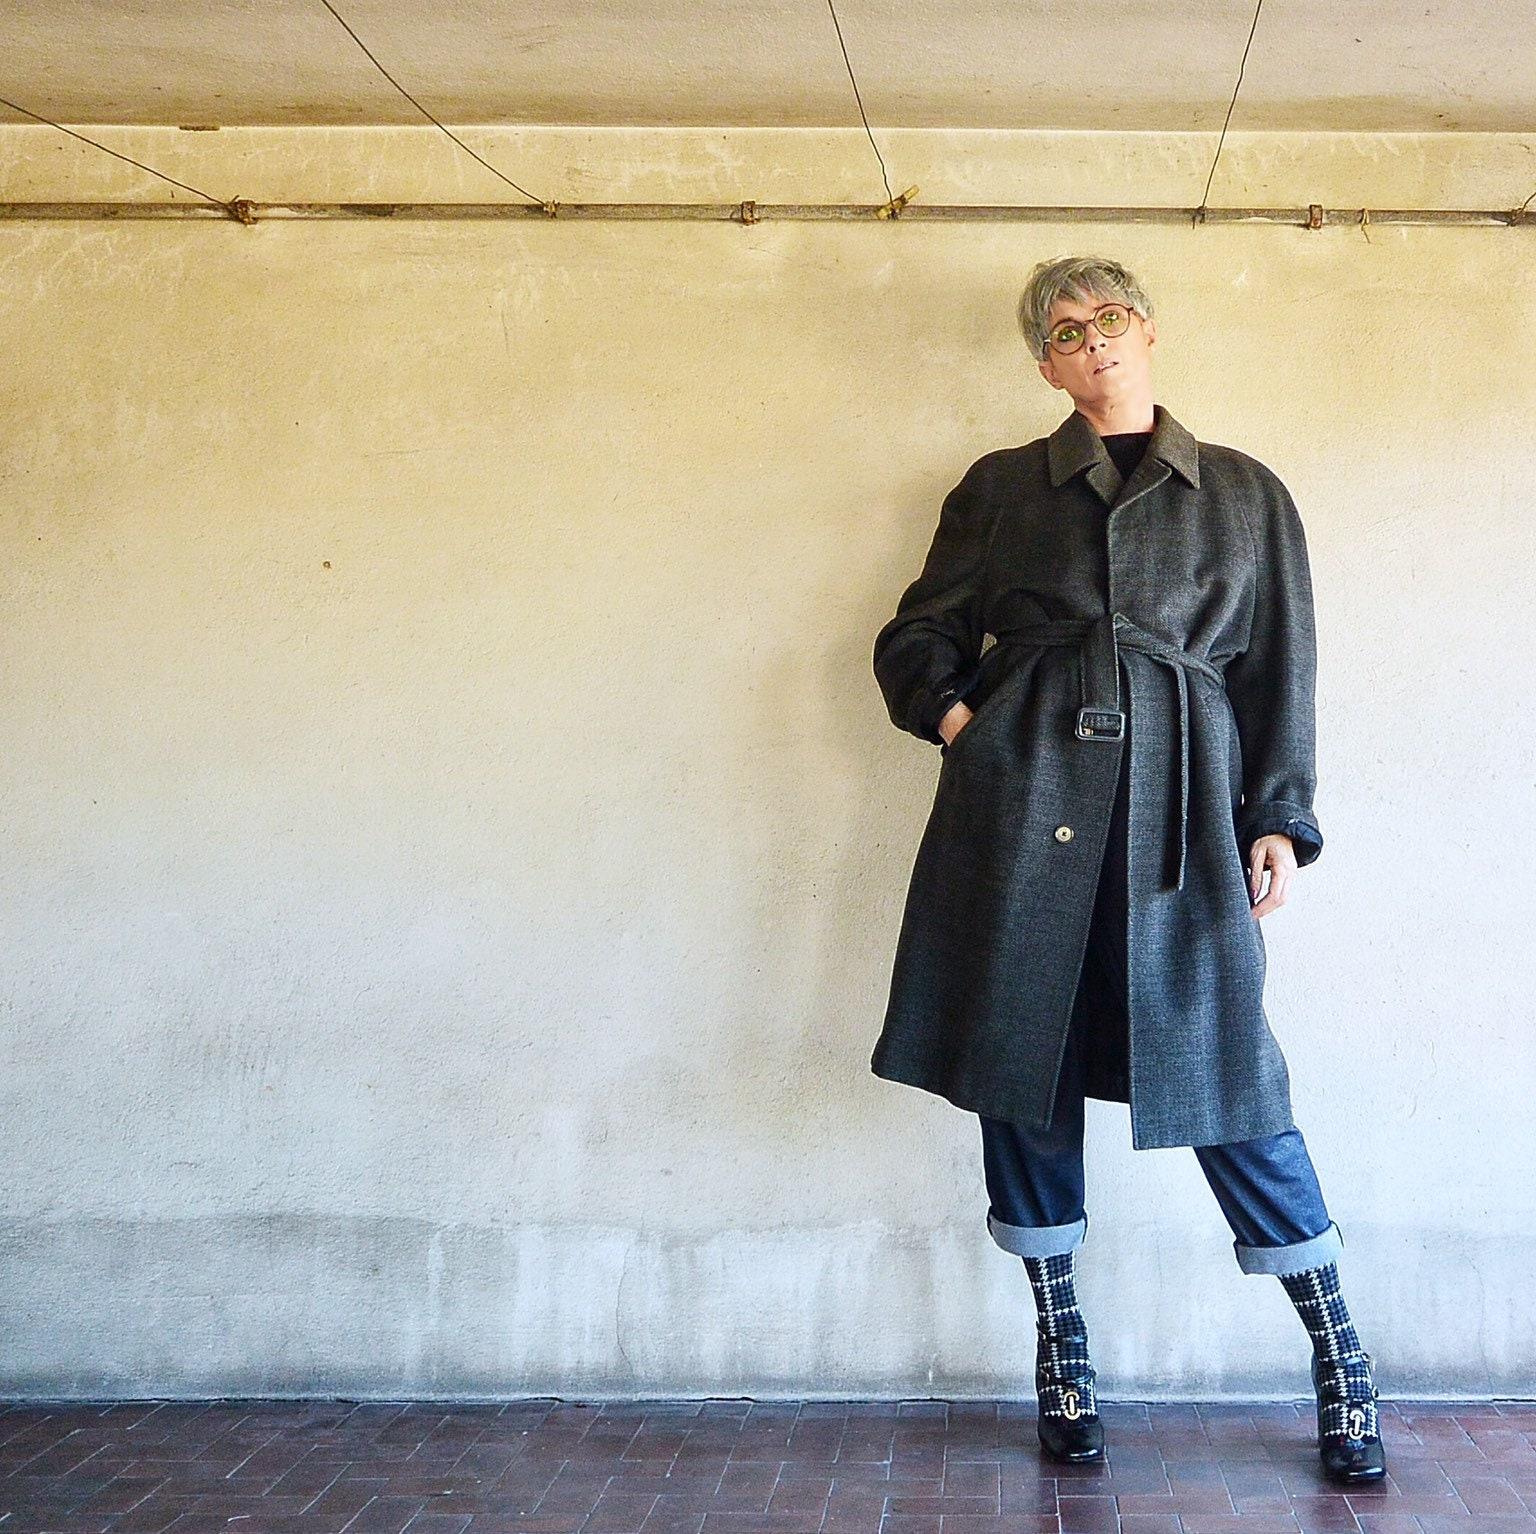 438f4a397b1c7 Yves Saint Laurent Coat  cappotto da uomo Yves Saint Laurent